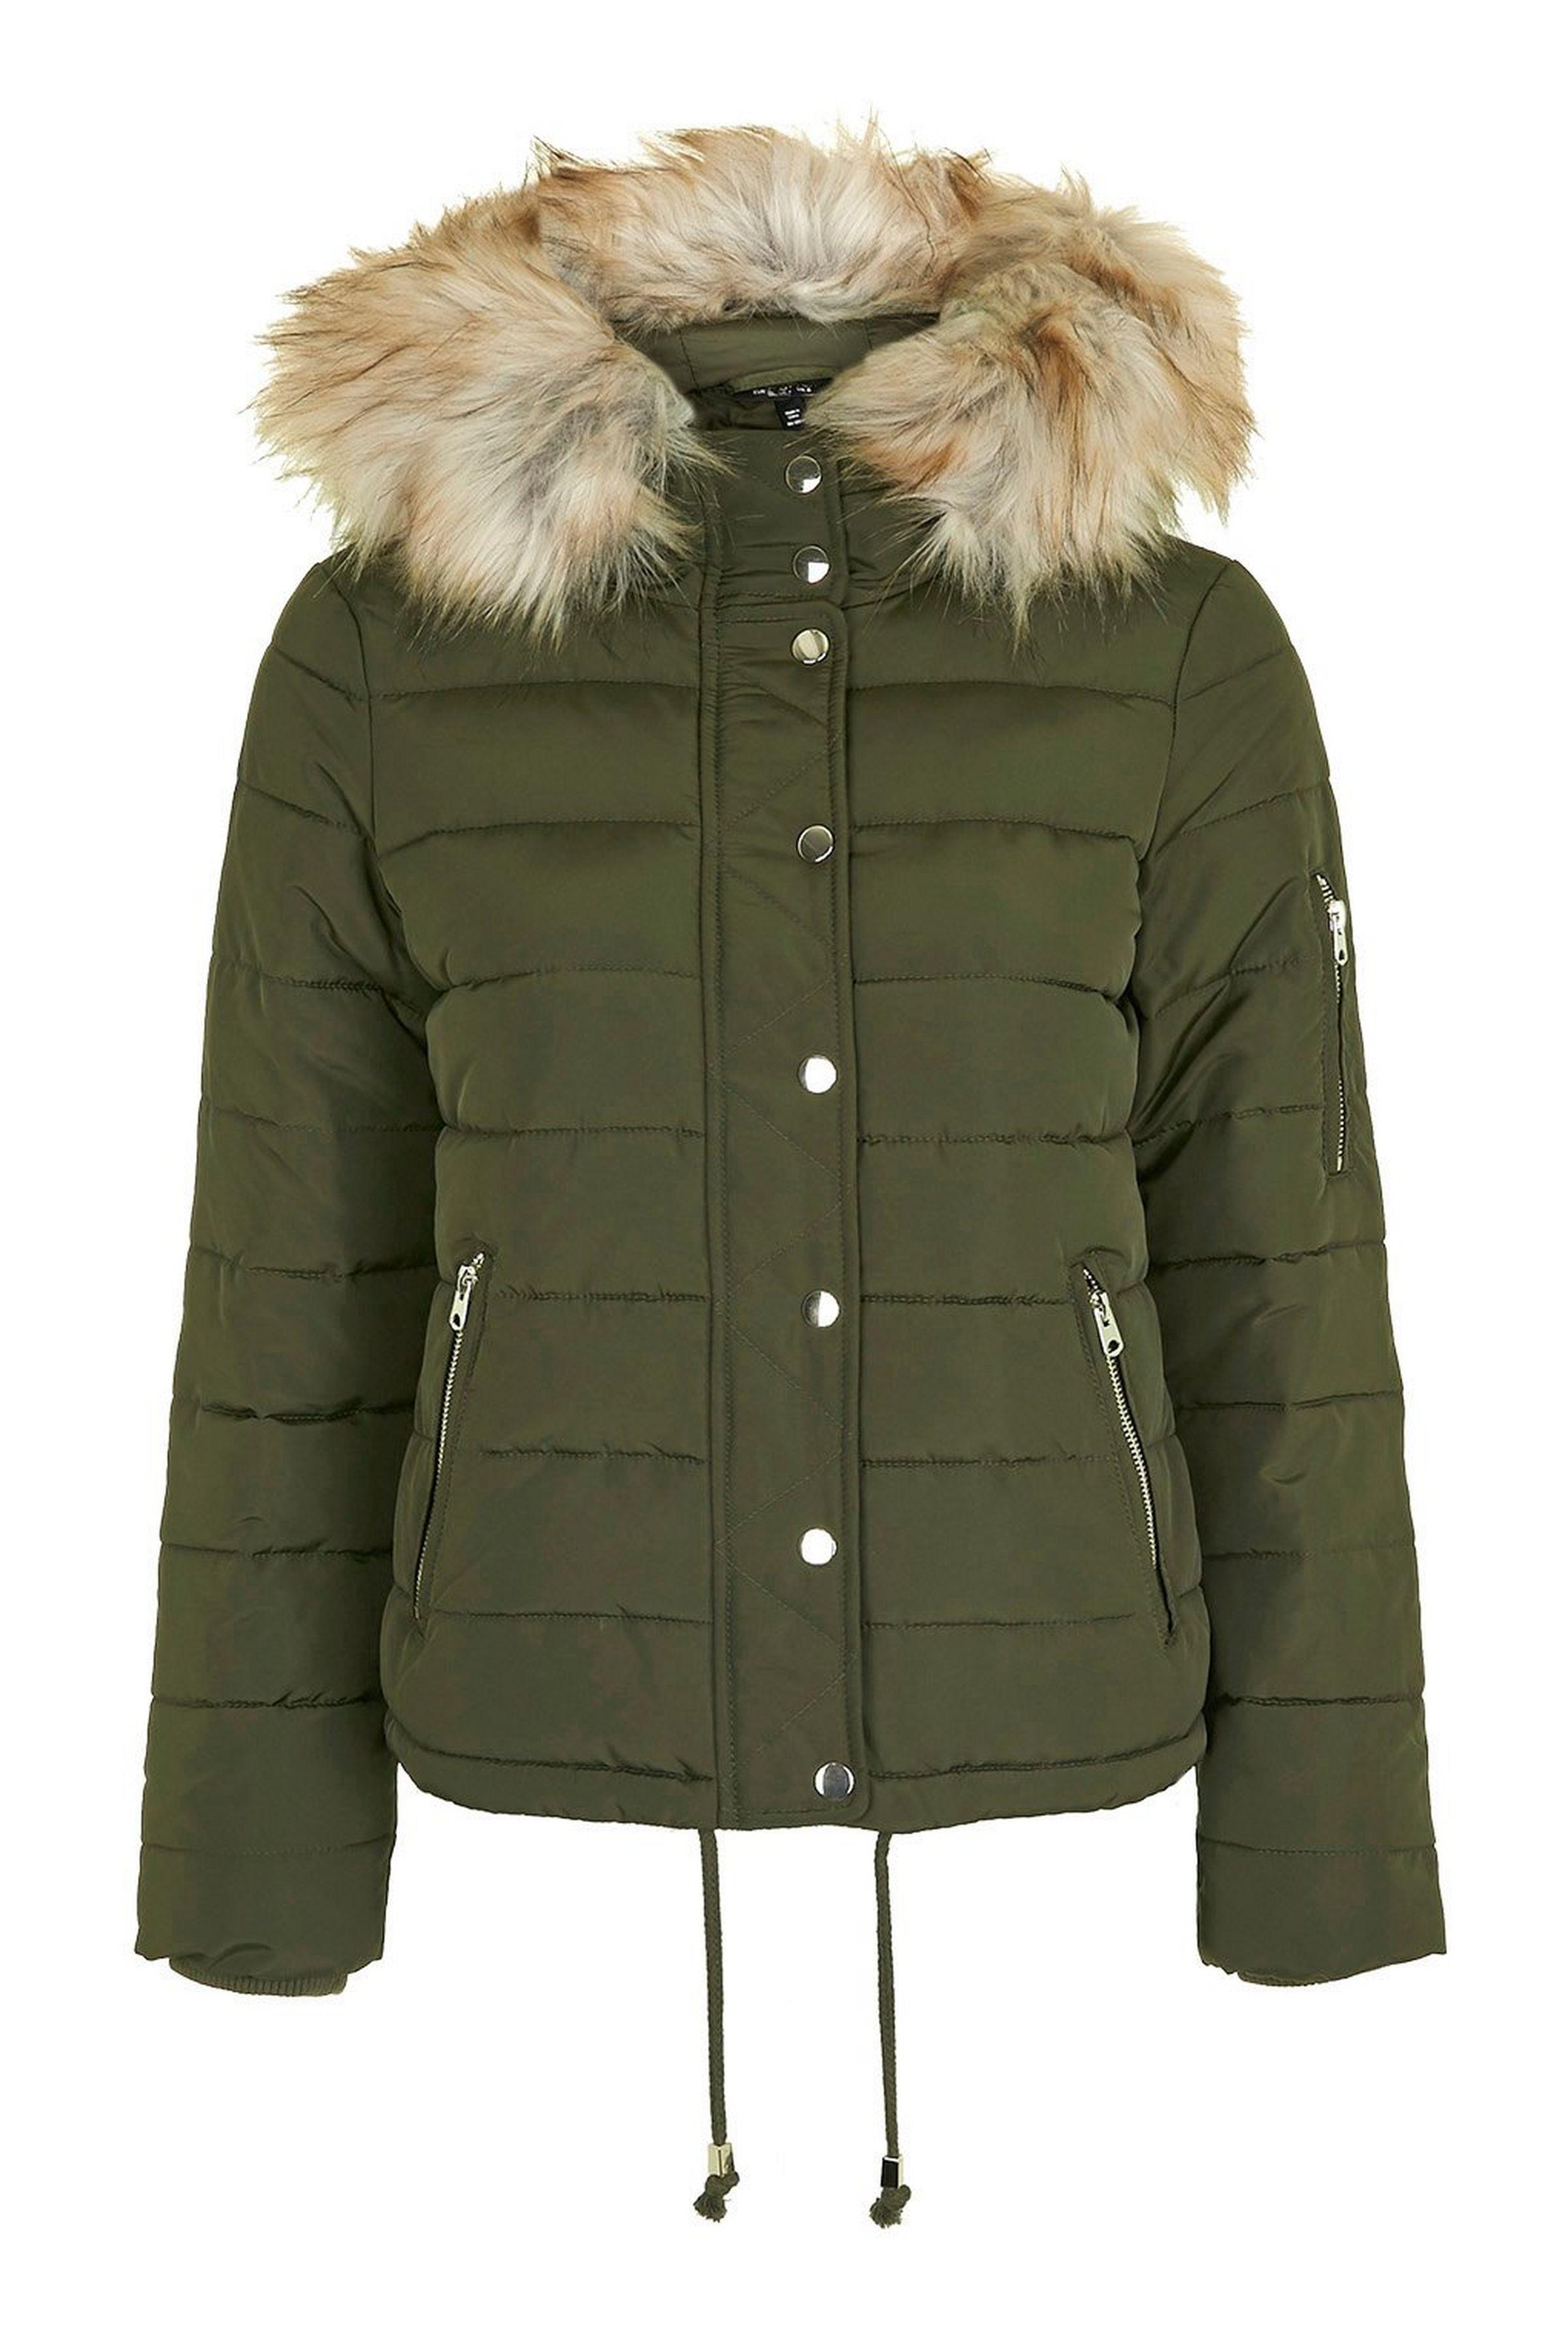 Quilted Puffer Jacket Quilted Puffer Jacket Winter Puffer Jackets Puffer Jackets